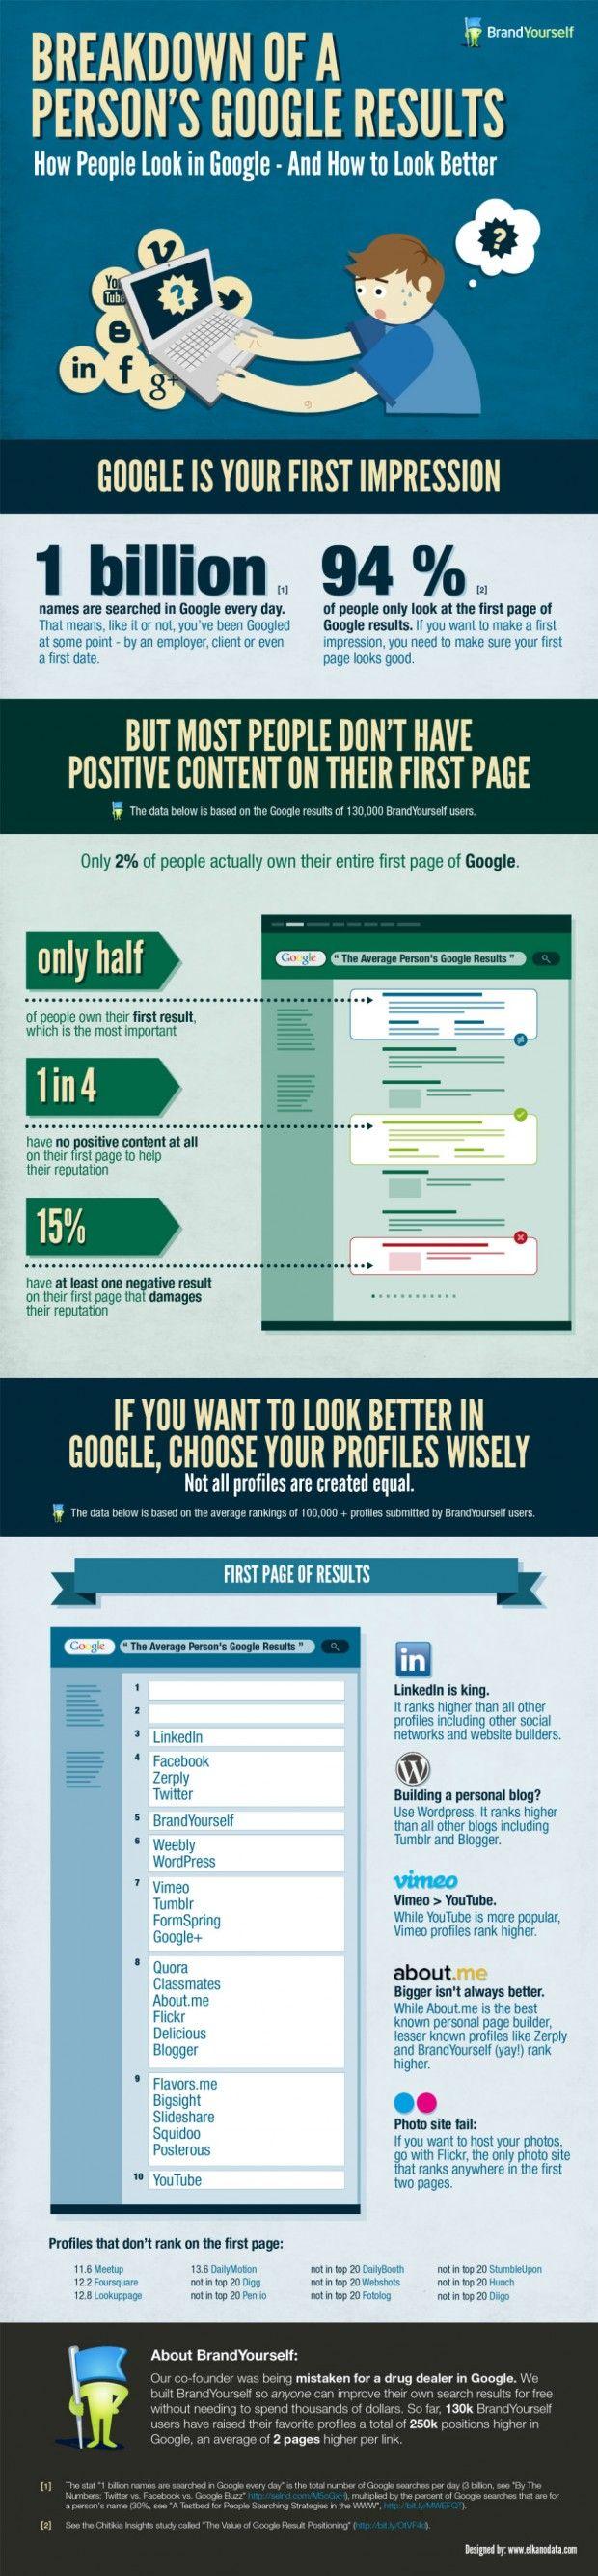 5 Useful Tips to Improve Your Google Profile #Infographic: Social Network, Socialmediamarketing, Personalized Brand,  Internet Site, Social Media Marketing,  Website, Web Site, Google Search, Infographic